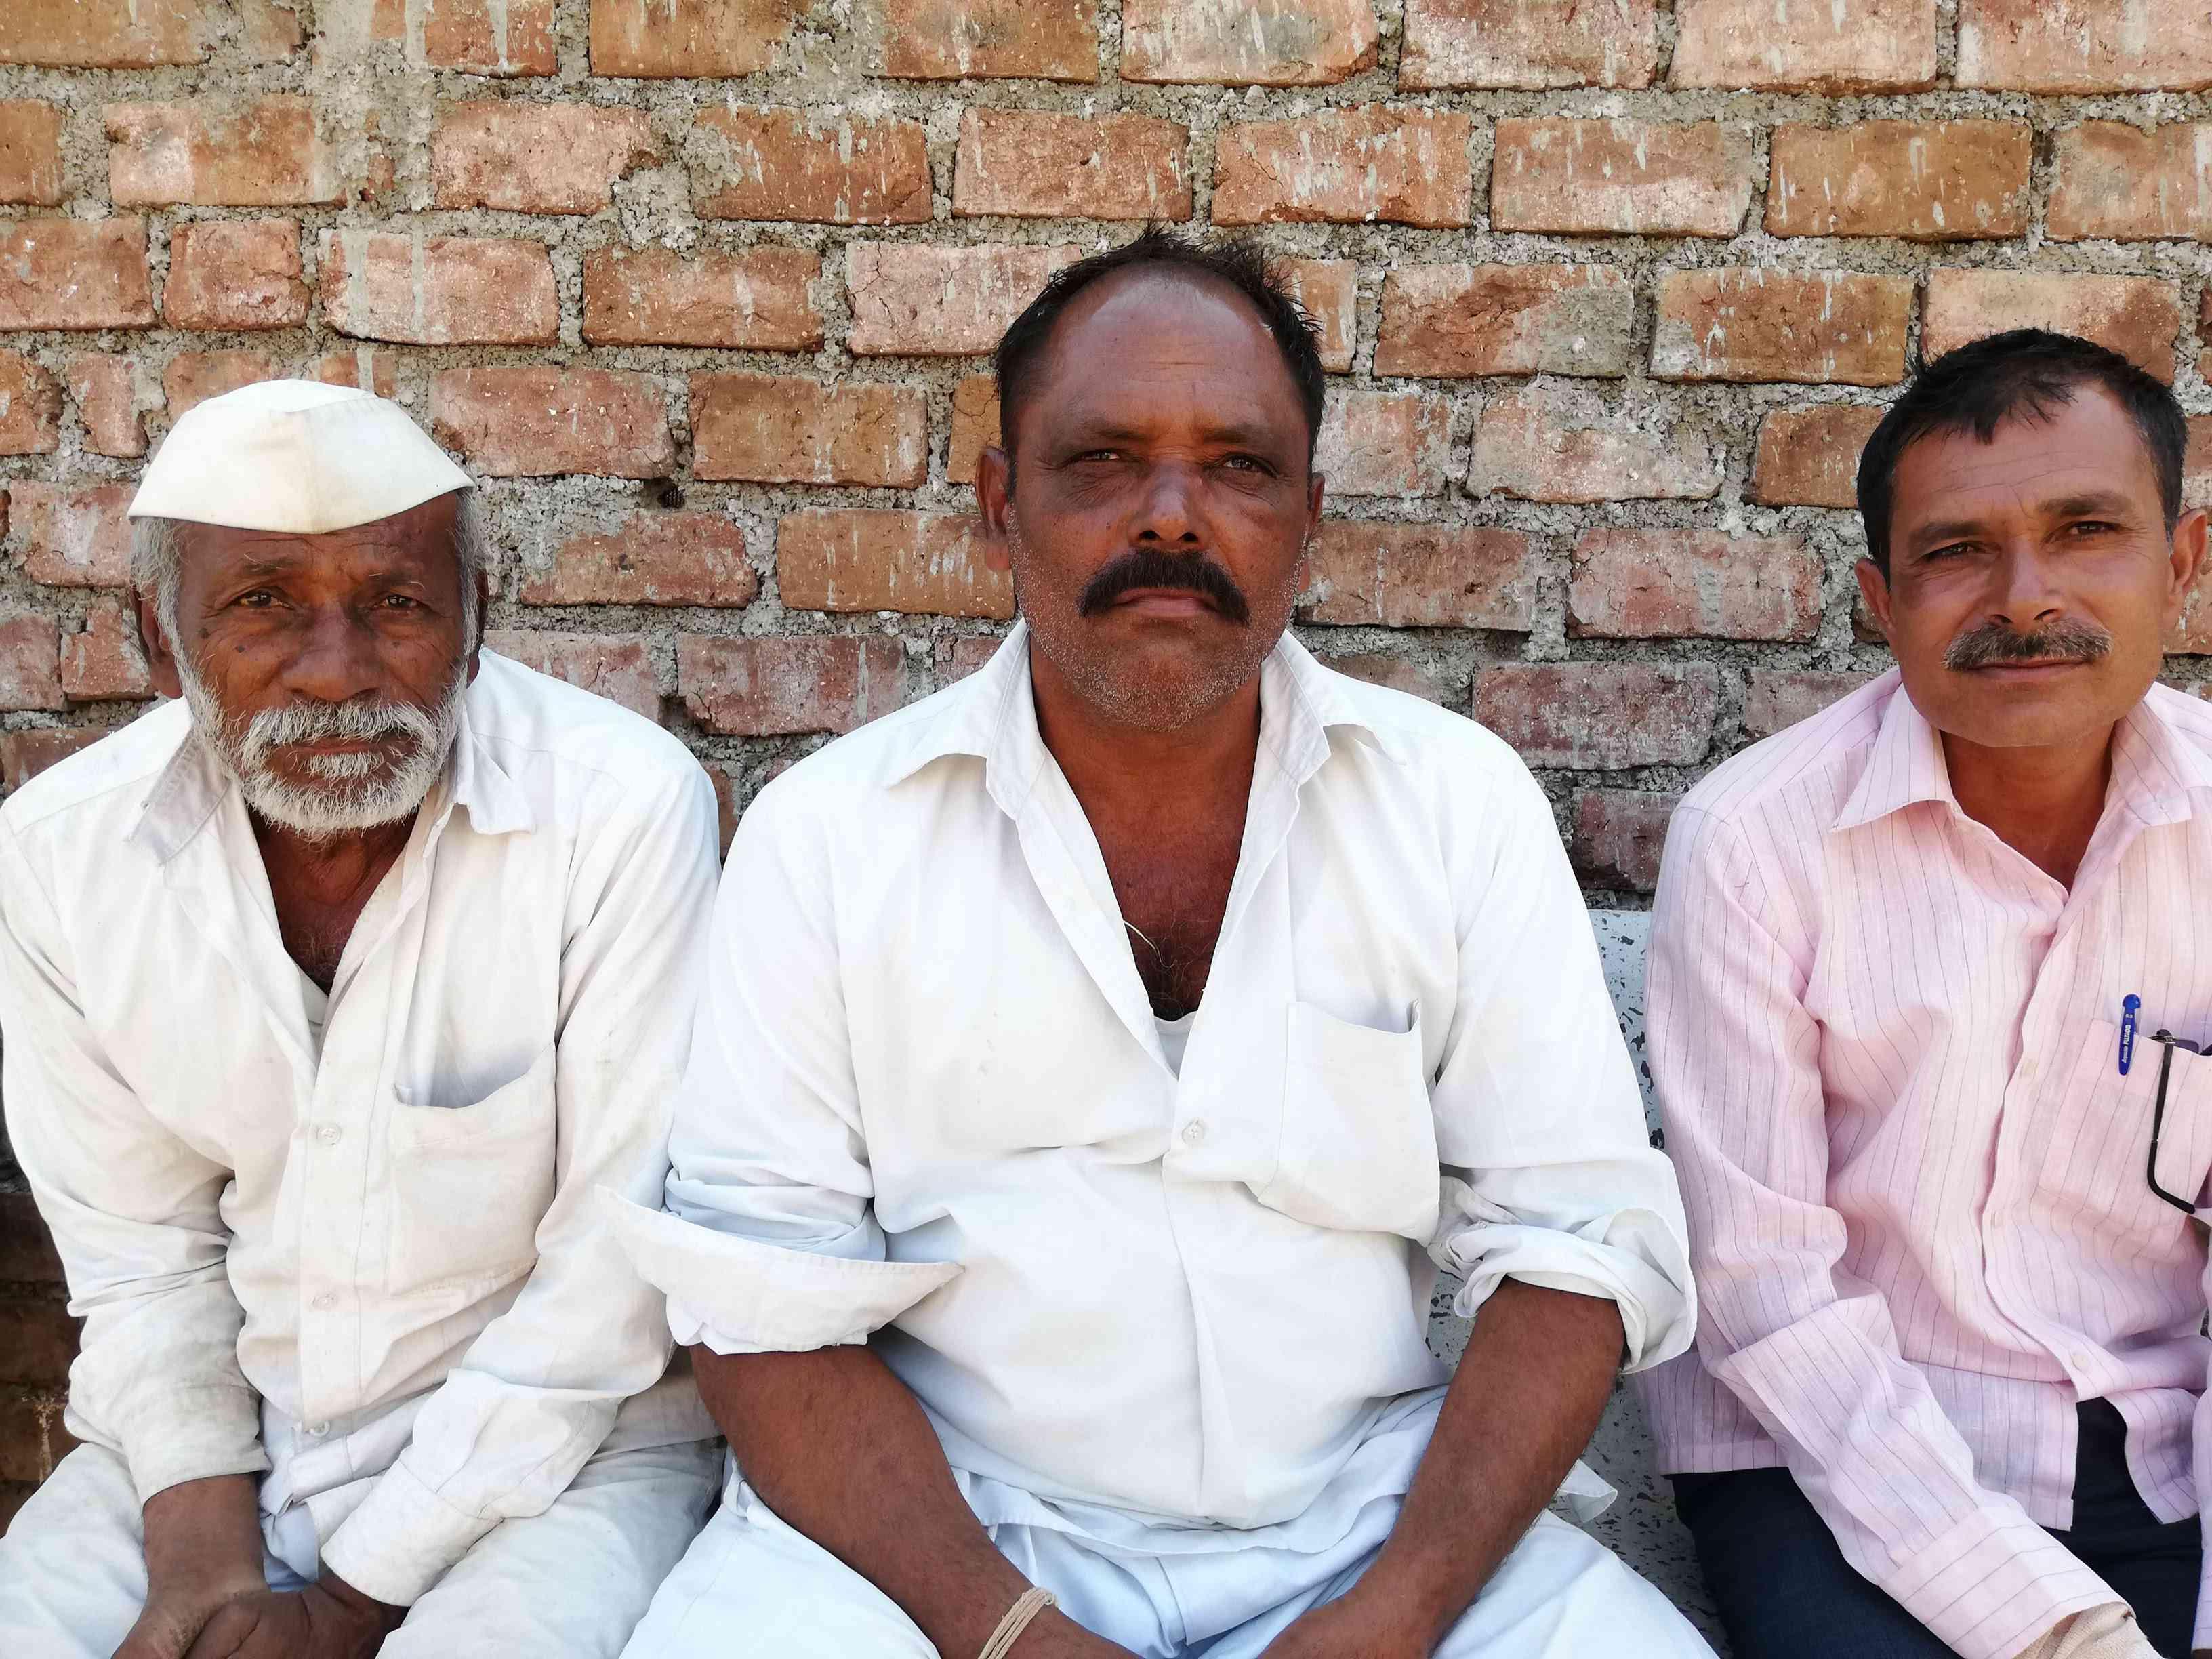 Ambadas Palve (centre) has faith in the BJP. (Photo credit: Mridula Chari).